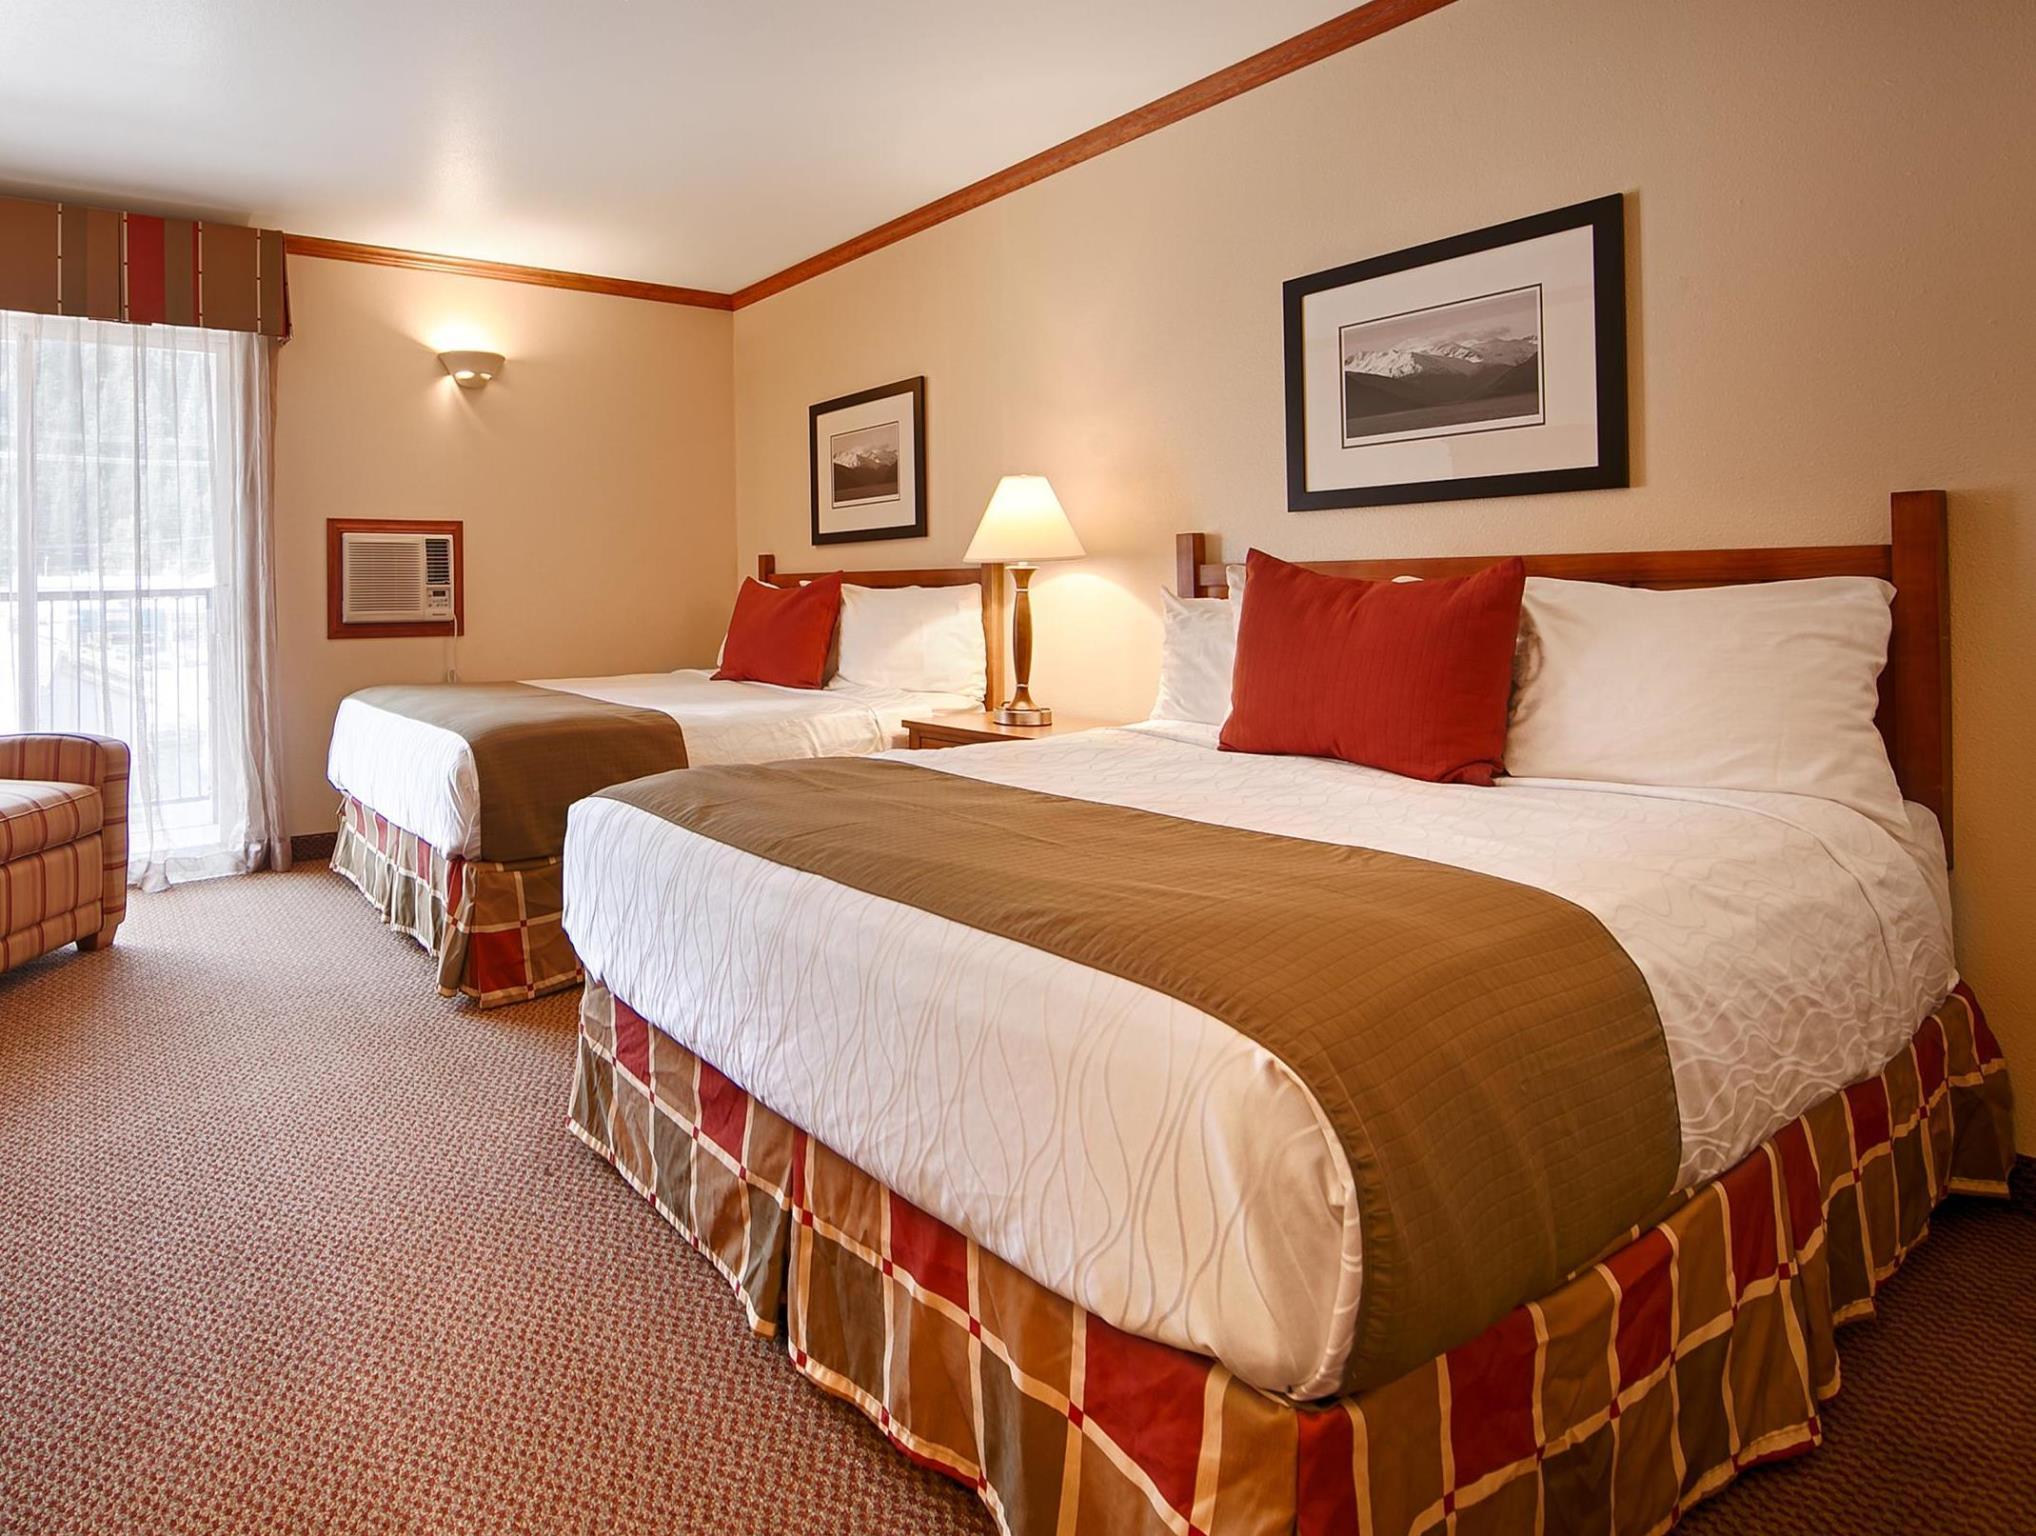 Best Western Plus Edgewater Hotel, Kenai Peninsula